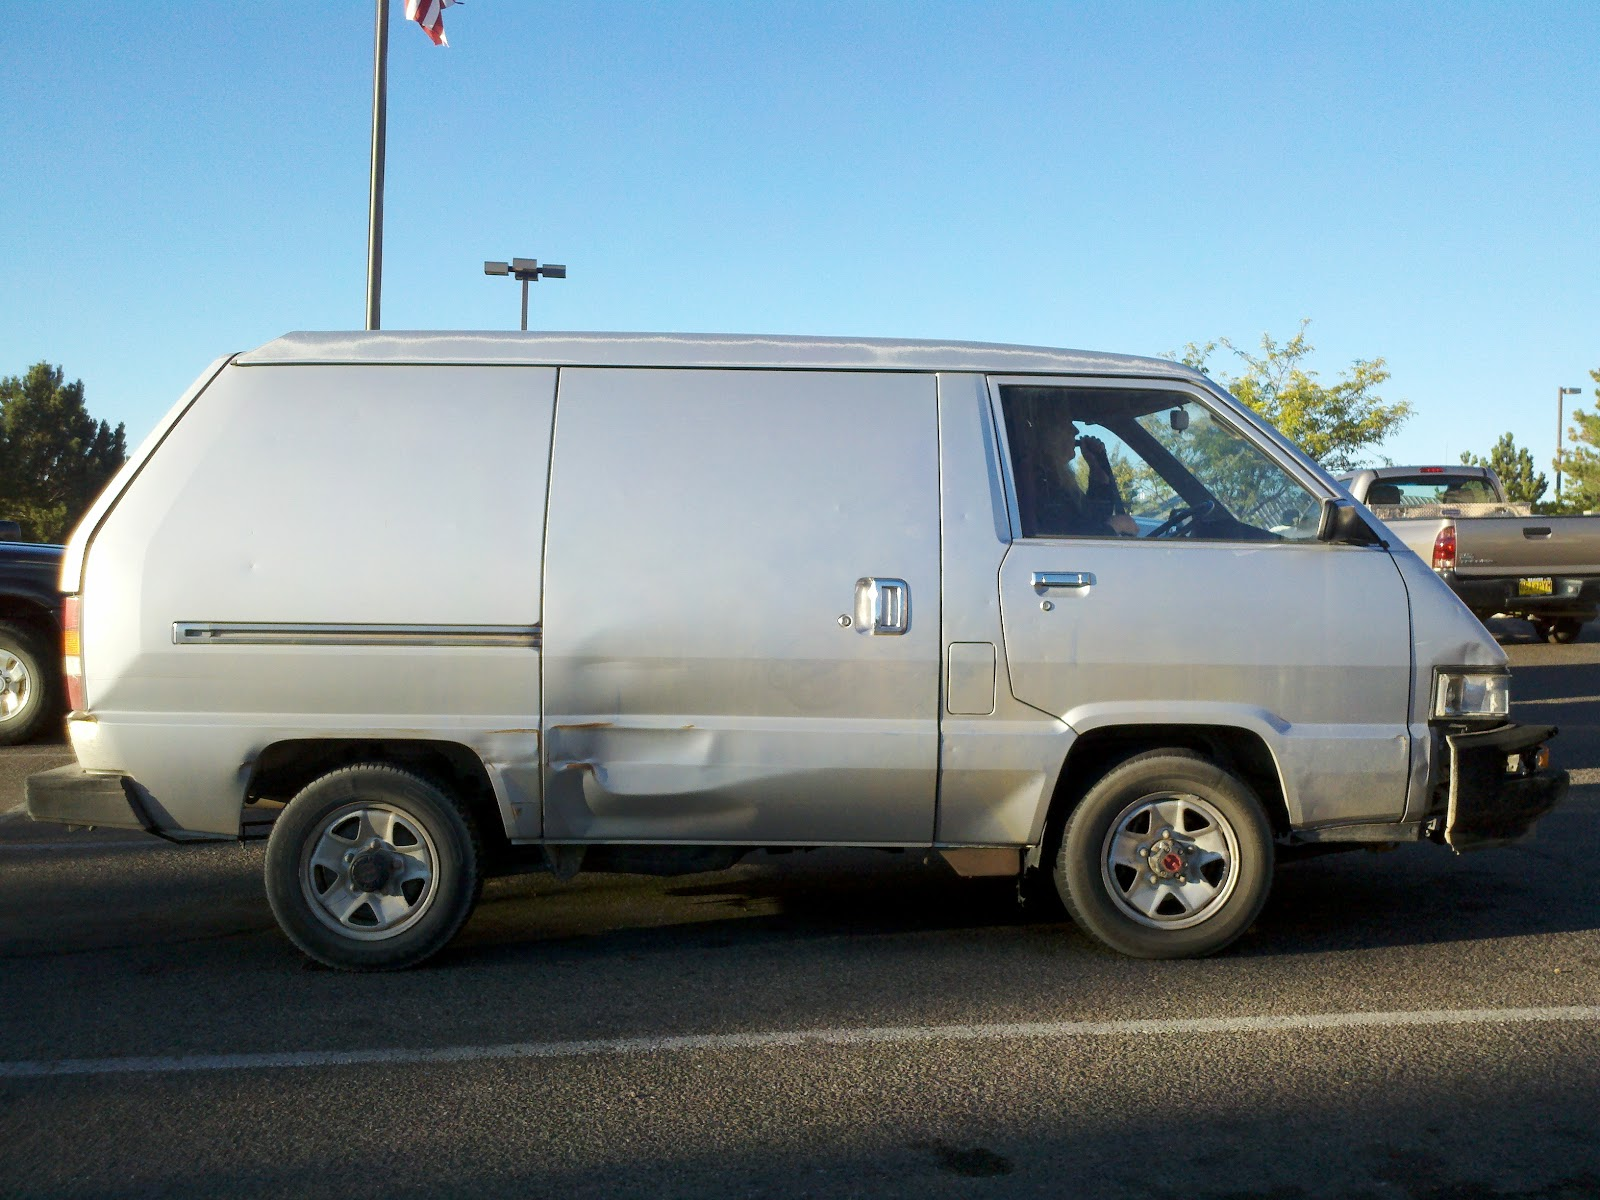 used 4 wheel drive vans for sale autos post. Black Bedroom Furniture Sets. Home Design Ideas